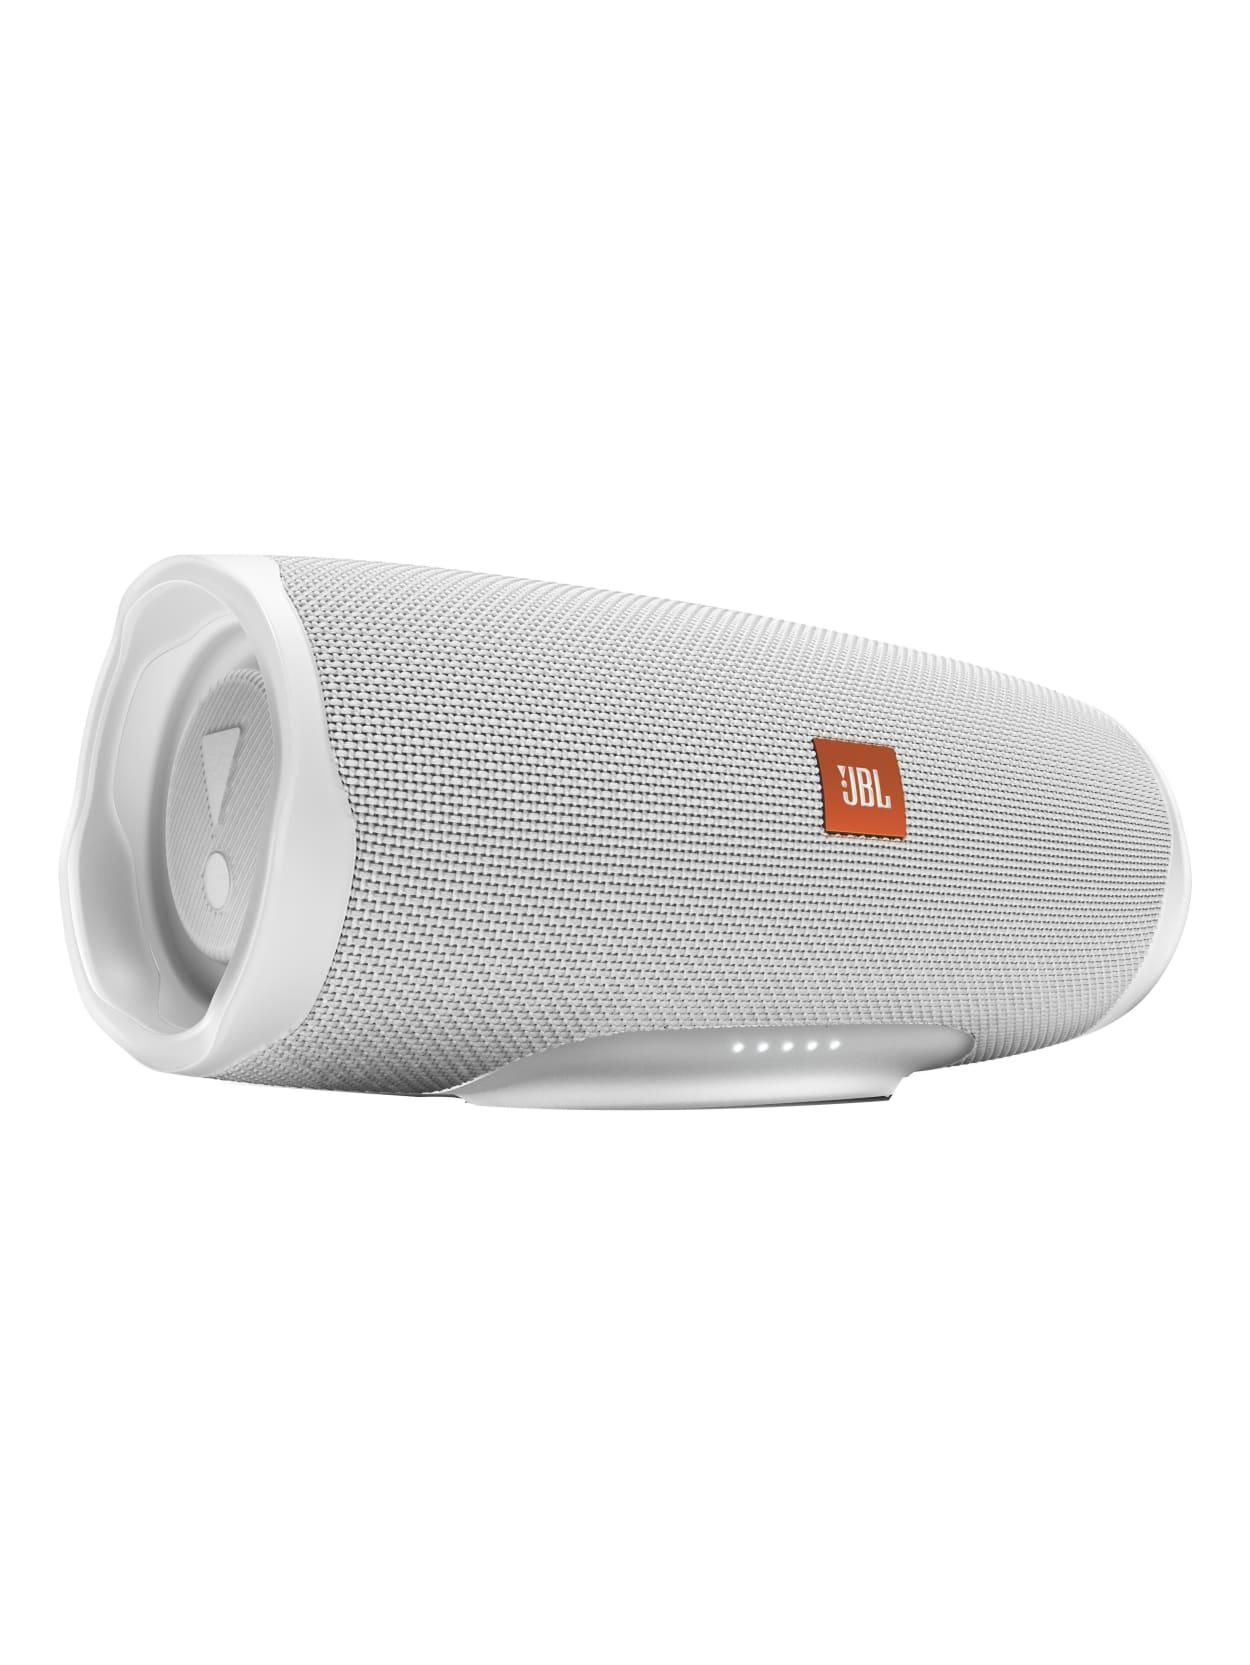 Jbl Charge 4 Bluetooth Speaker White Office Depot